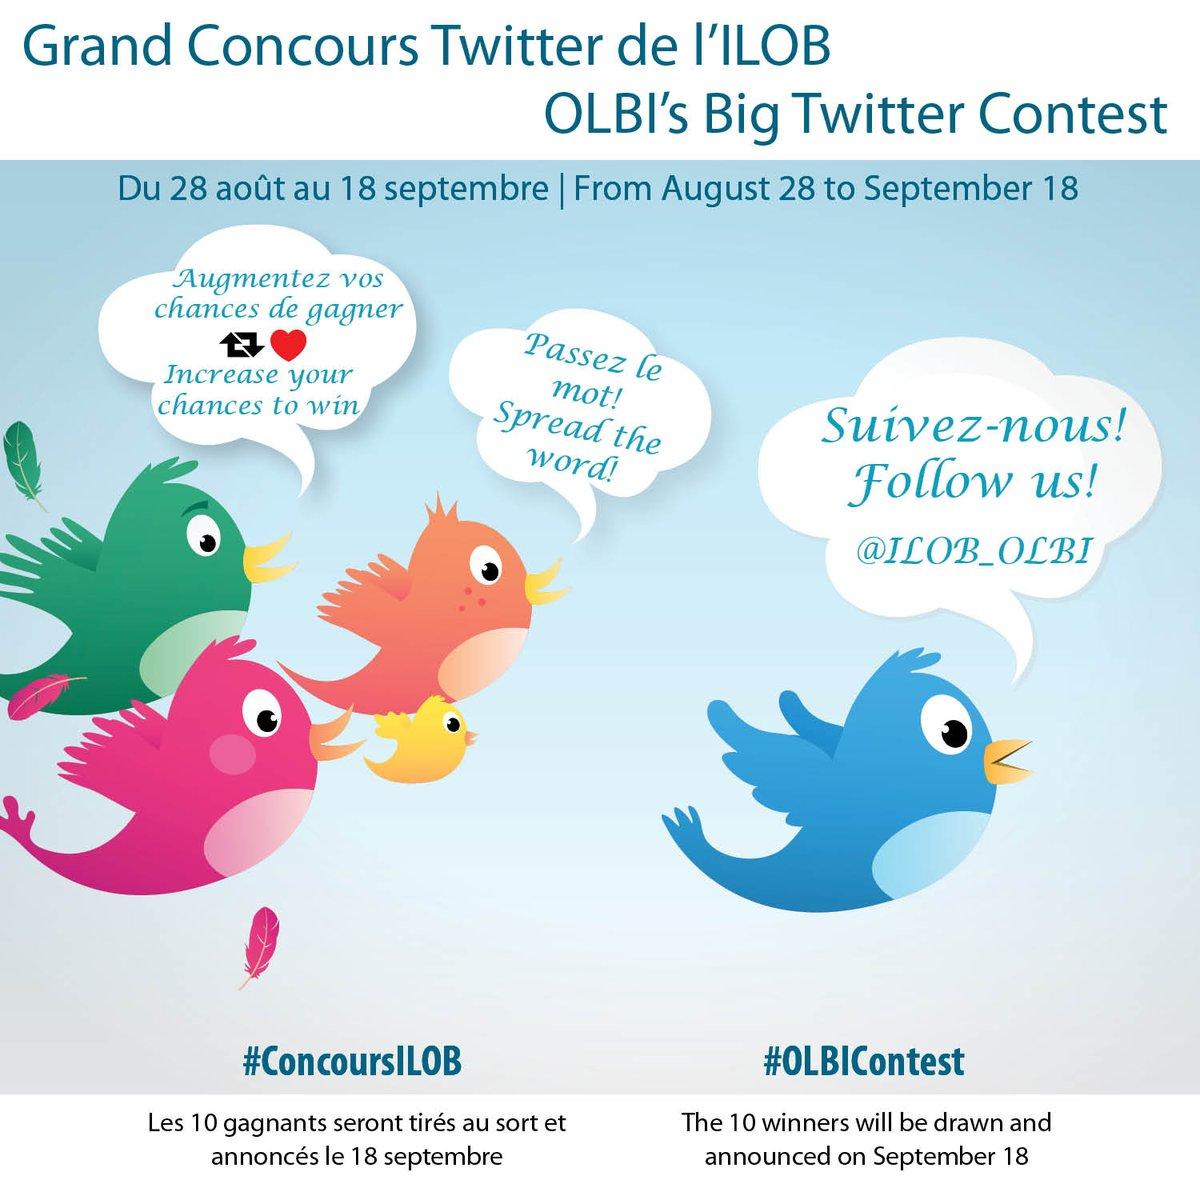 Easy as ABC  #ConcoursILOB #OLBIConstest #tirage #draw #uOttawa #F4F #l4f #l4l #RETWEEET #Ottawa #University<br>http://pic.twitter.com/O5hN1tmeso